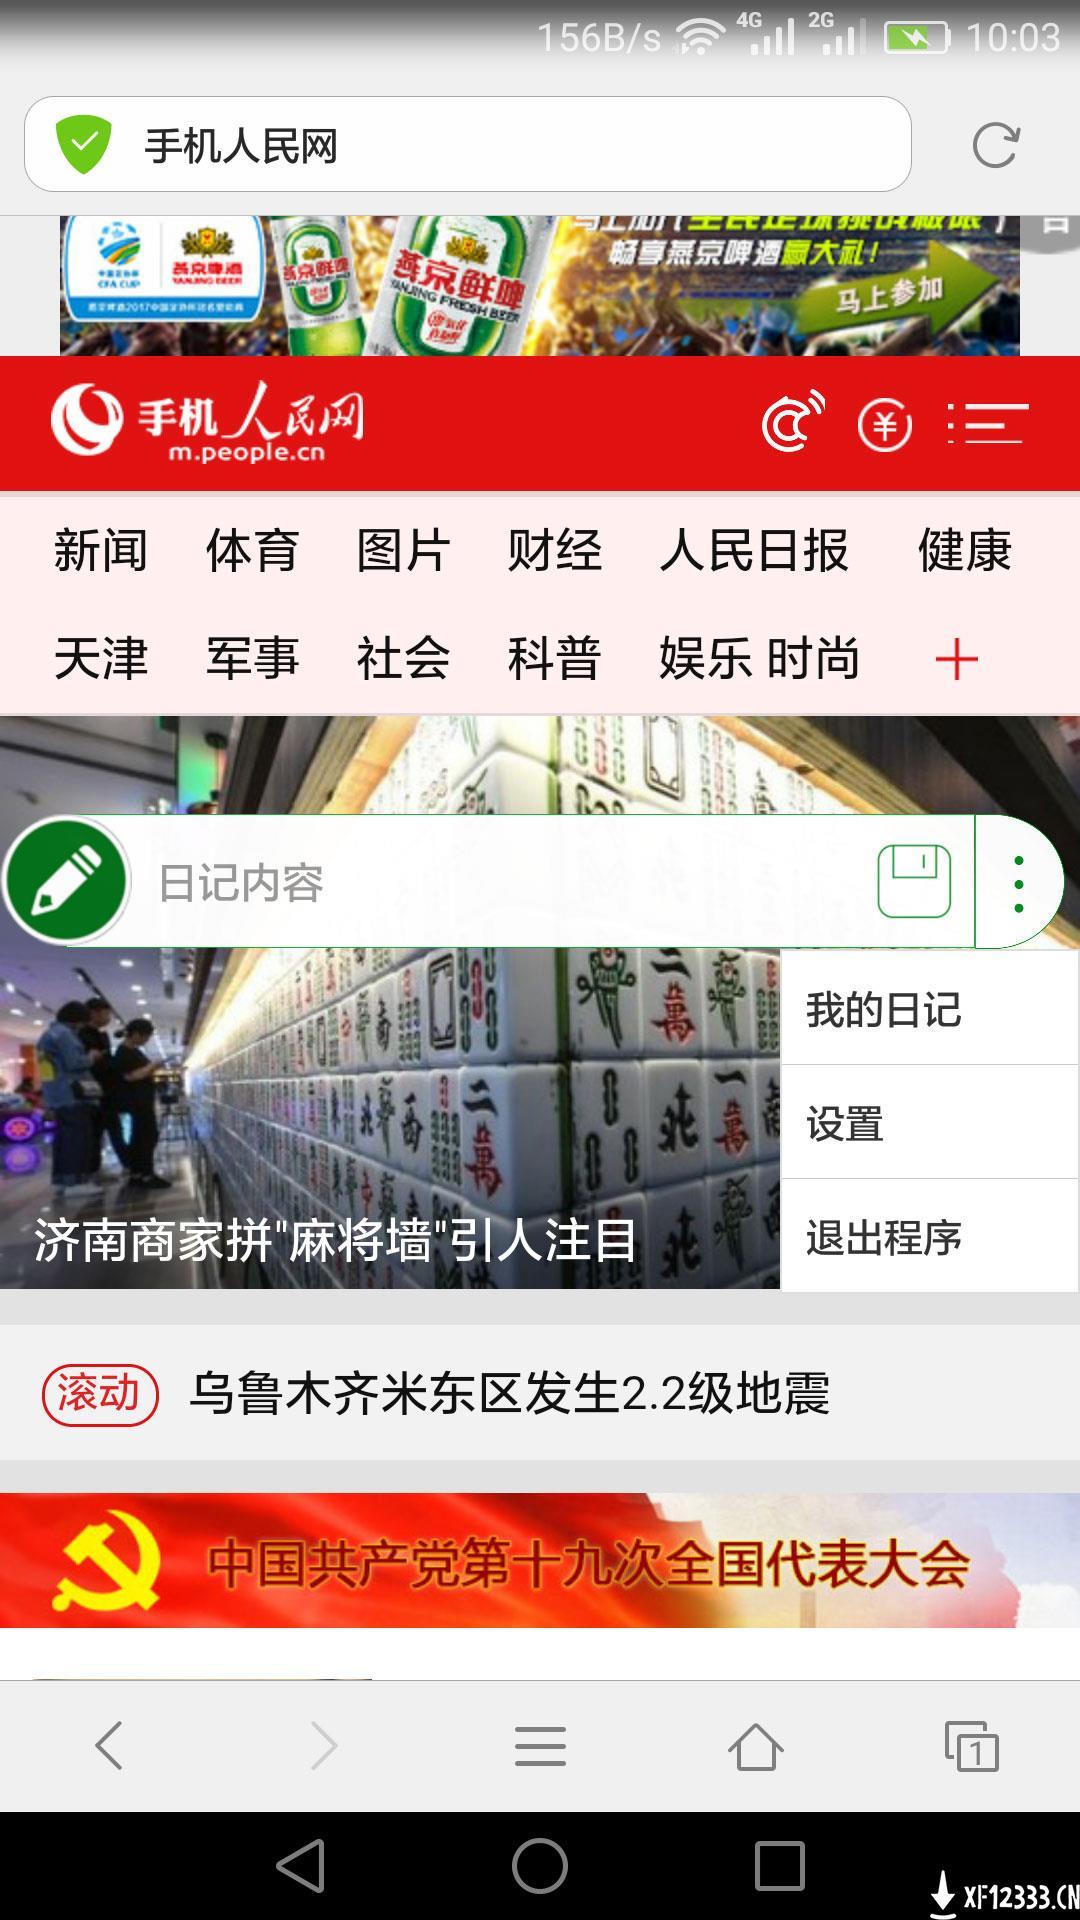 iNote悬浮记事本app下载_iNote悬浮记事本app最新版免费下载